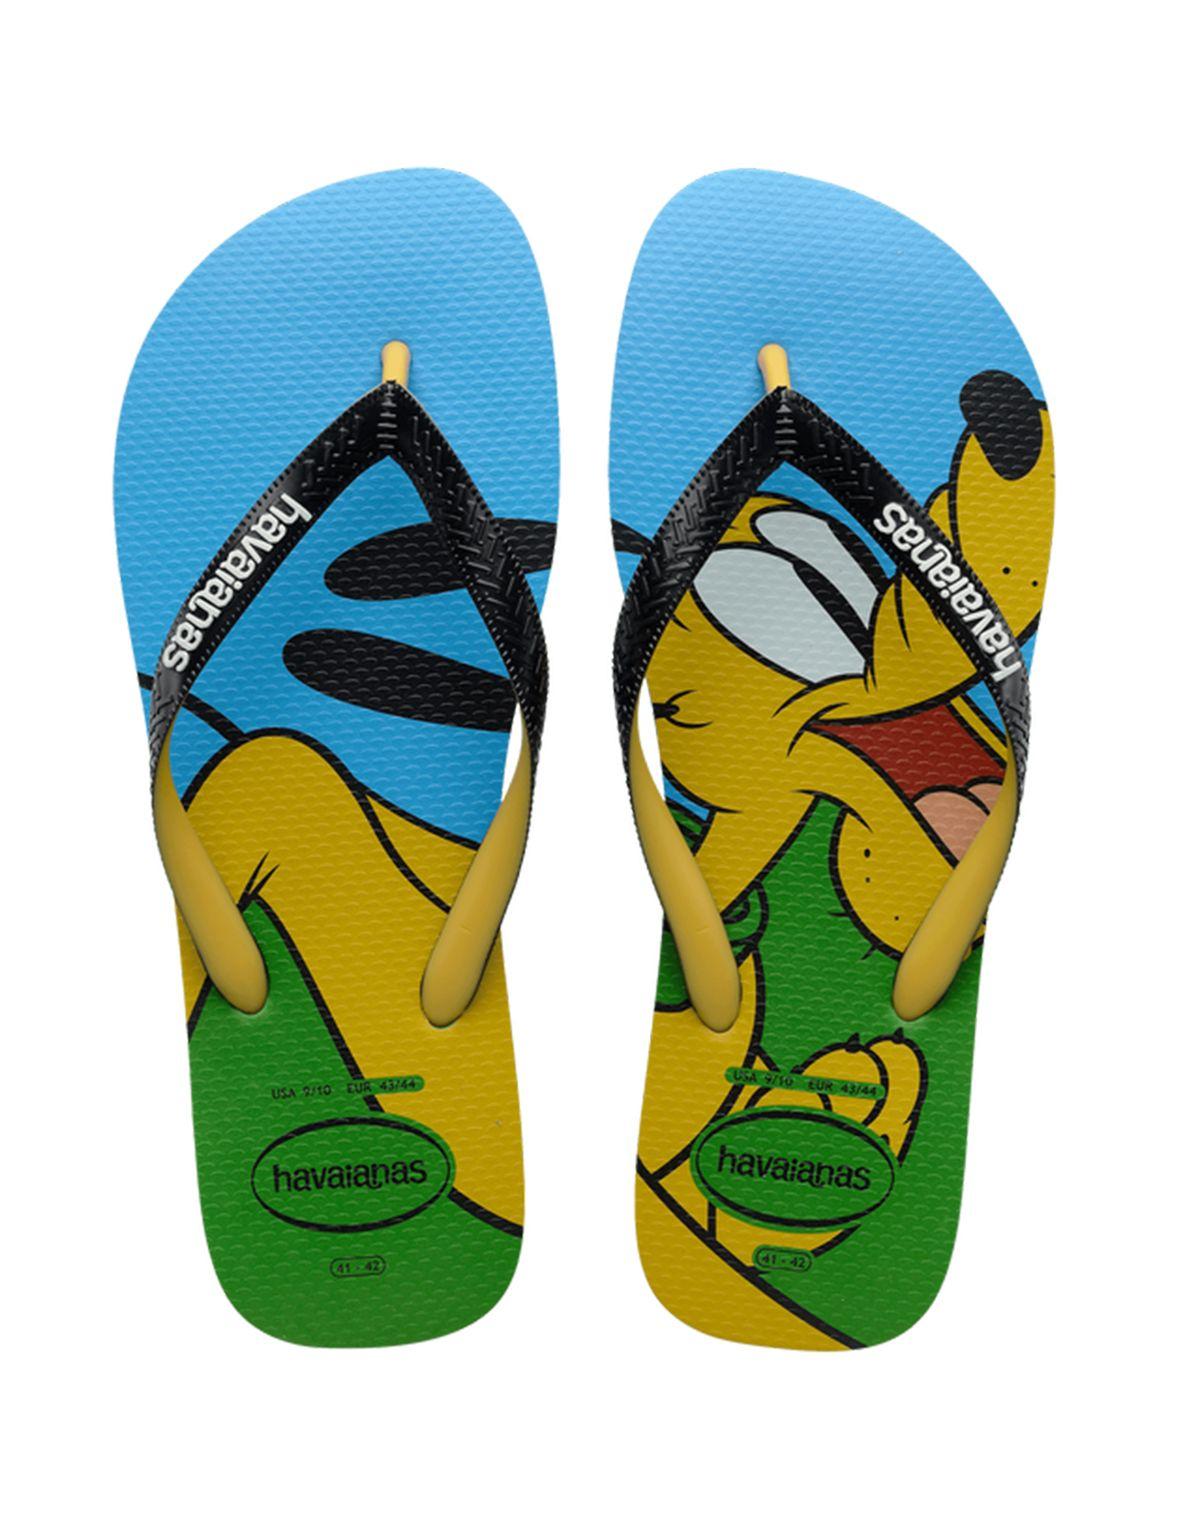 558840008-chinelo-masculino-havaianas-mickey-disney-stylish-verde-39-0-74b